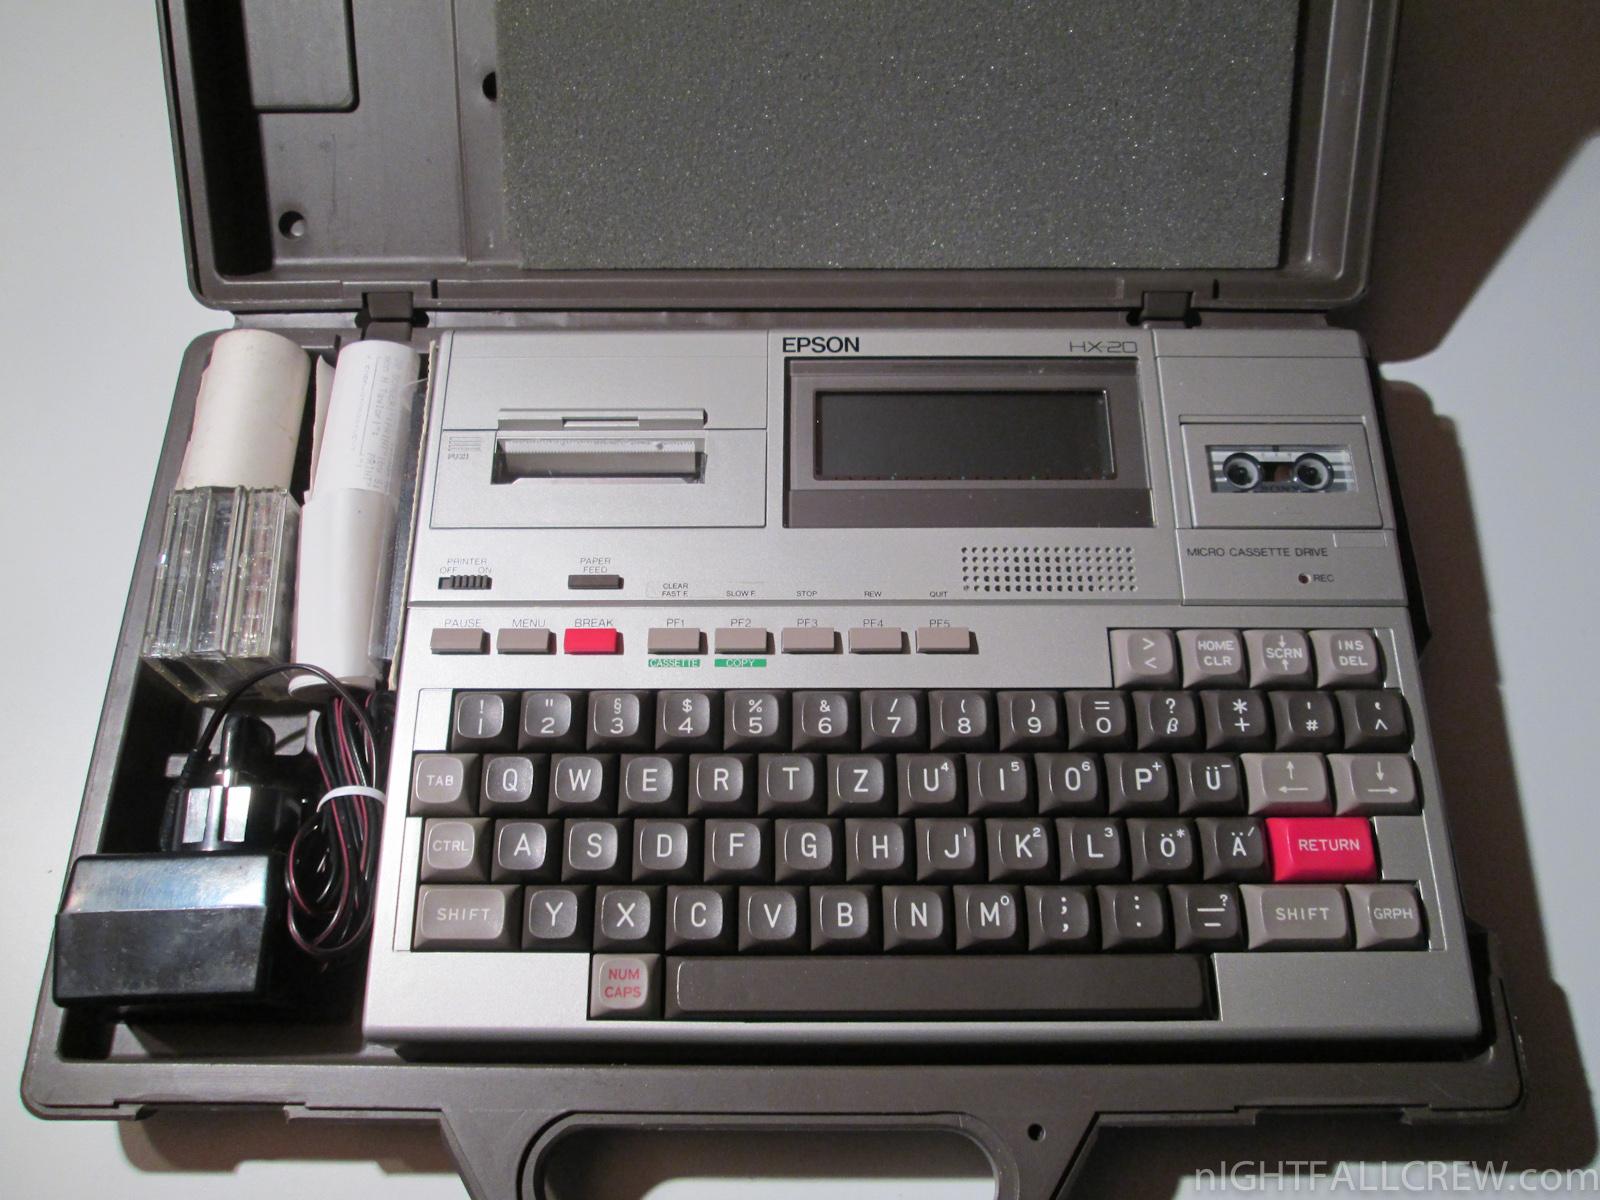 hx-20